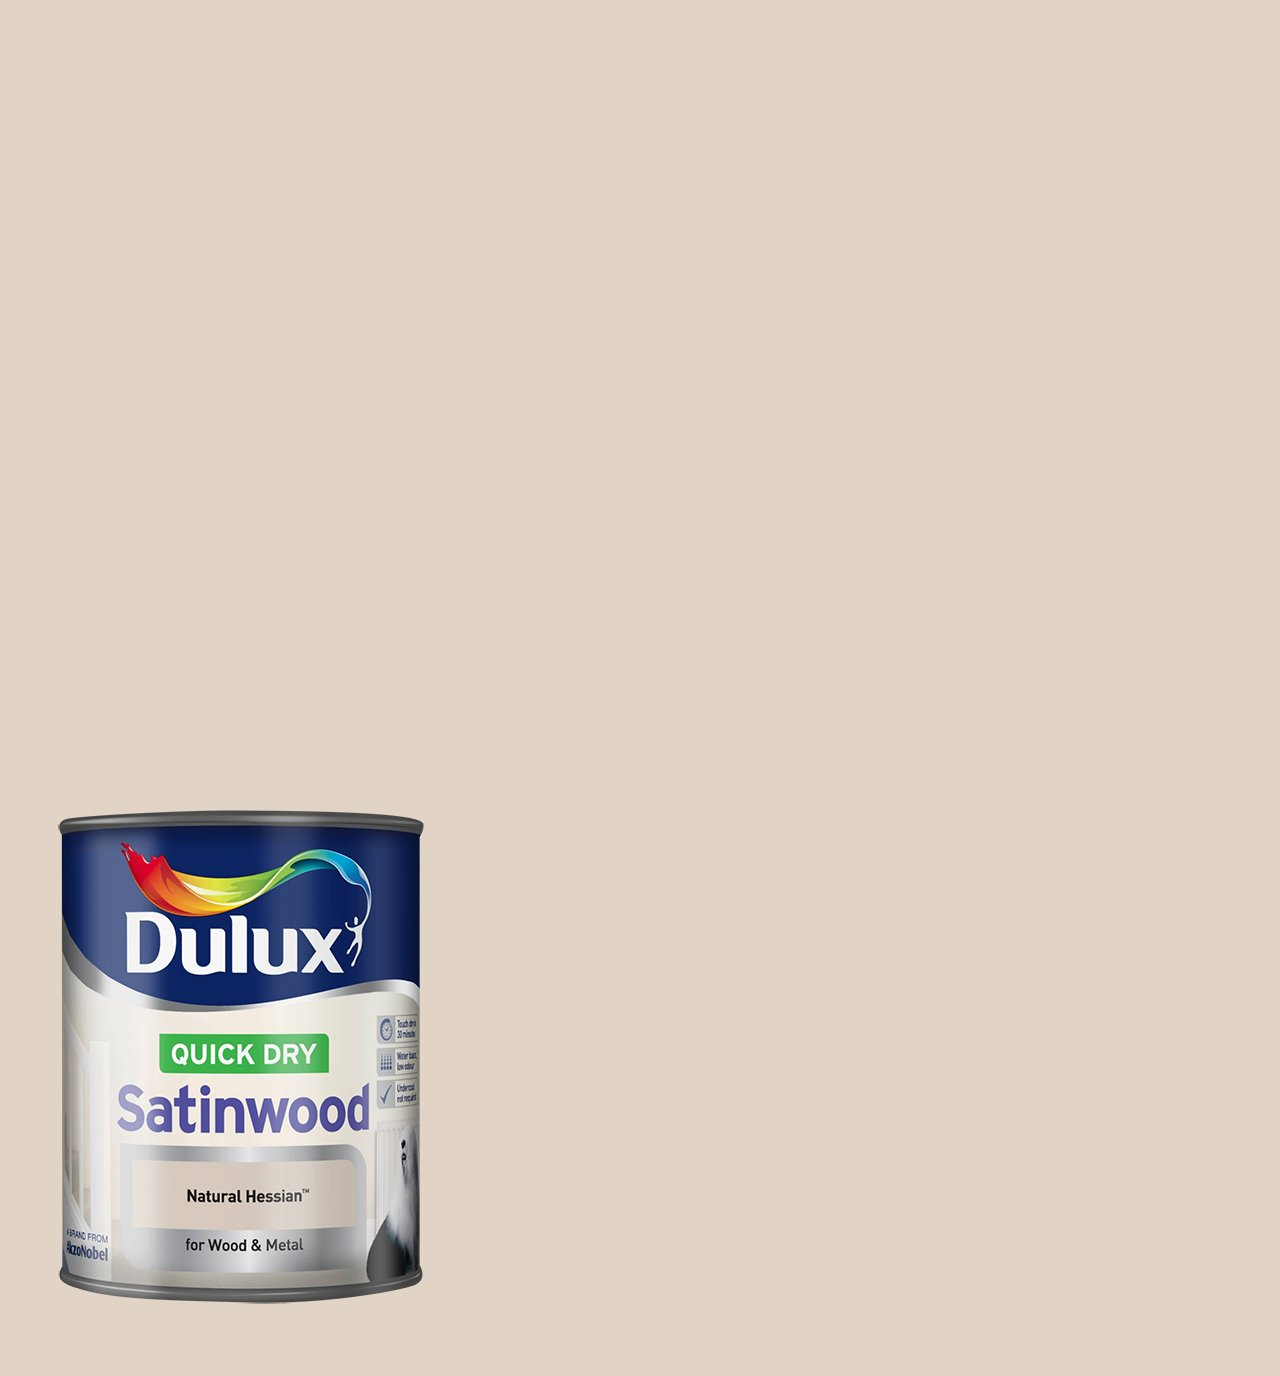 Dulux Quick Dry Satinwood Paint, 750 ml - Barley White AkzoNobel 750ML